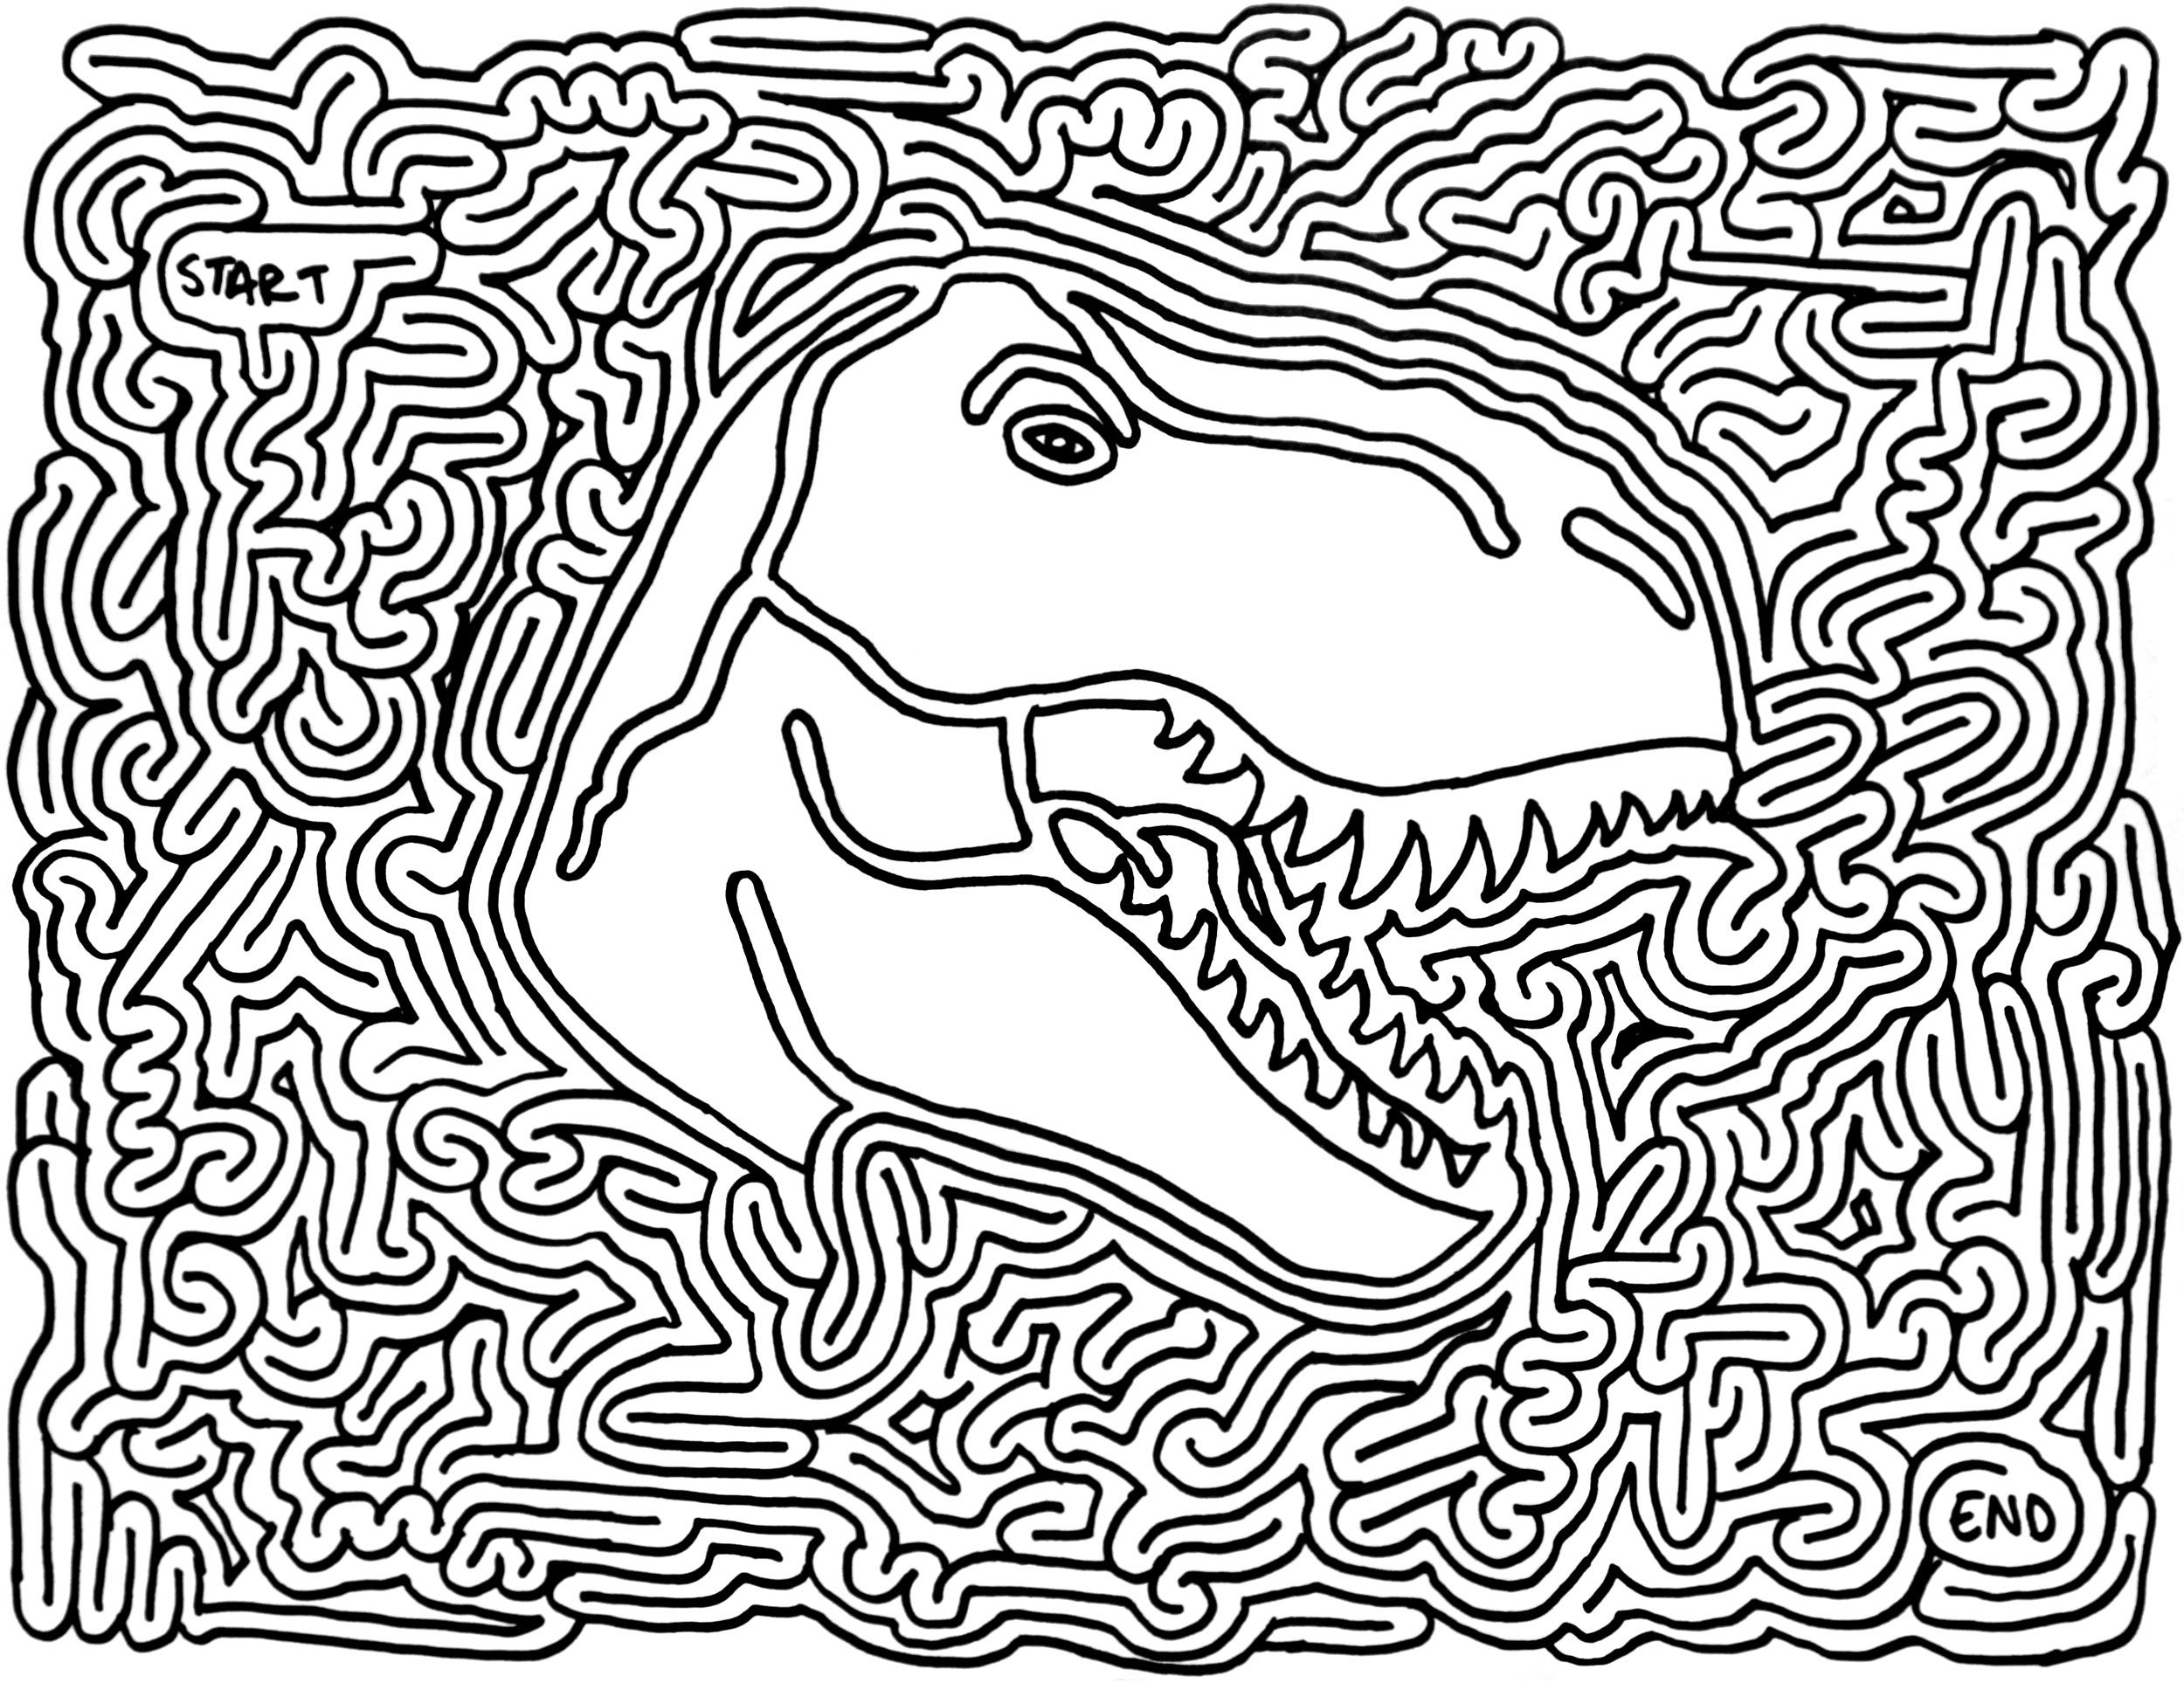 Favors - Dinosaur Printable Maze | Dinosaur Party | Pinterest ...